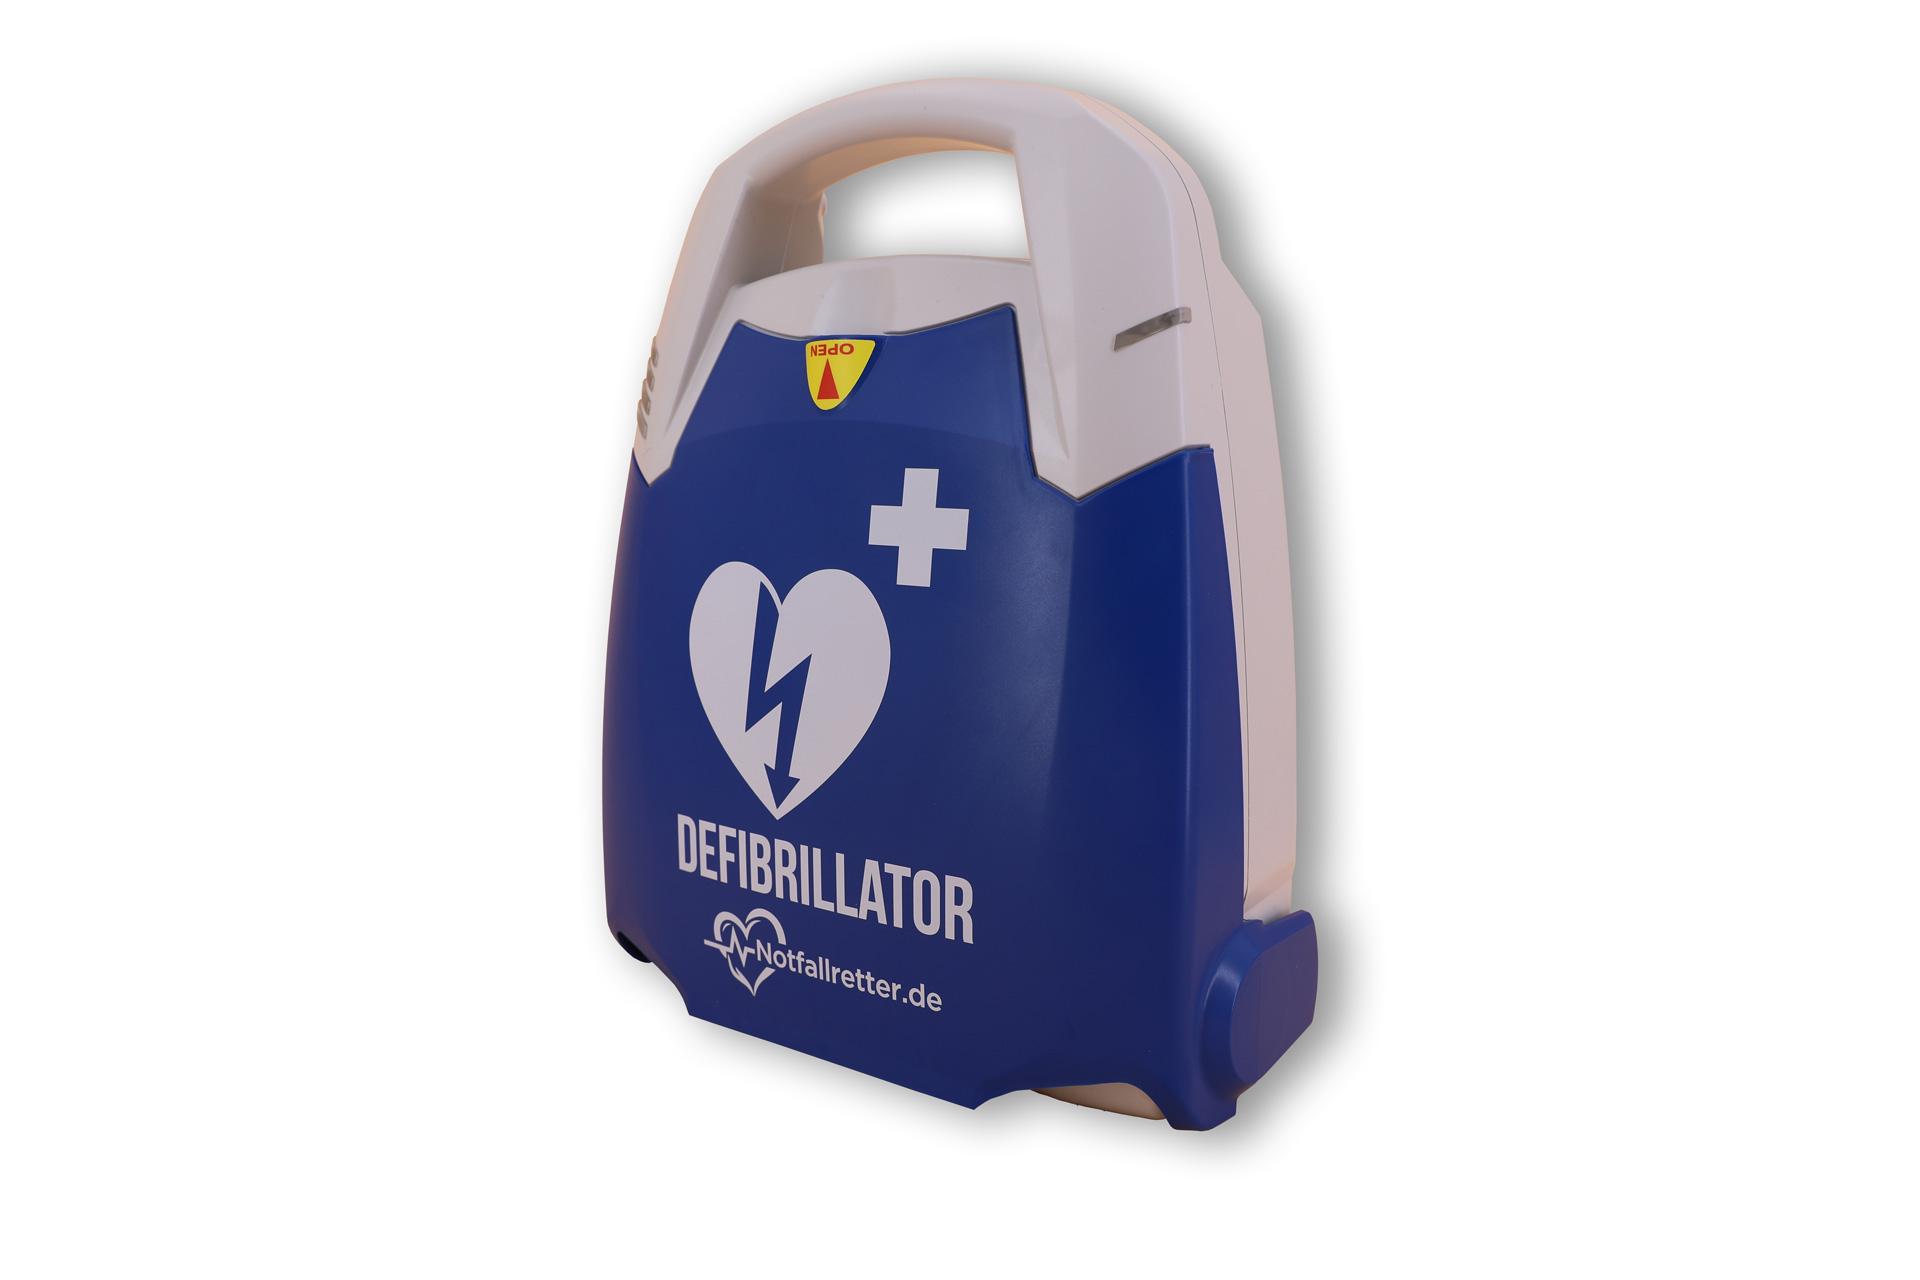 Notfallretter.de® Basic AED - recchte Seite